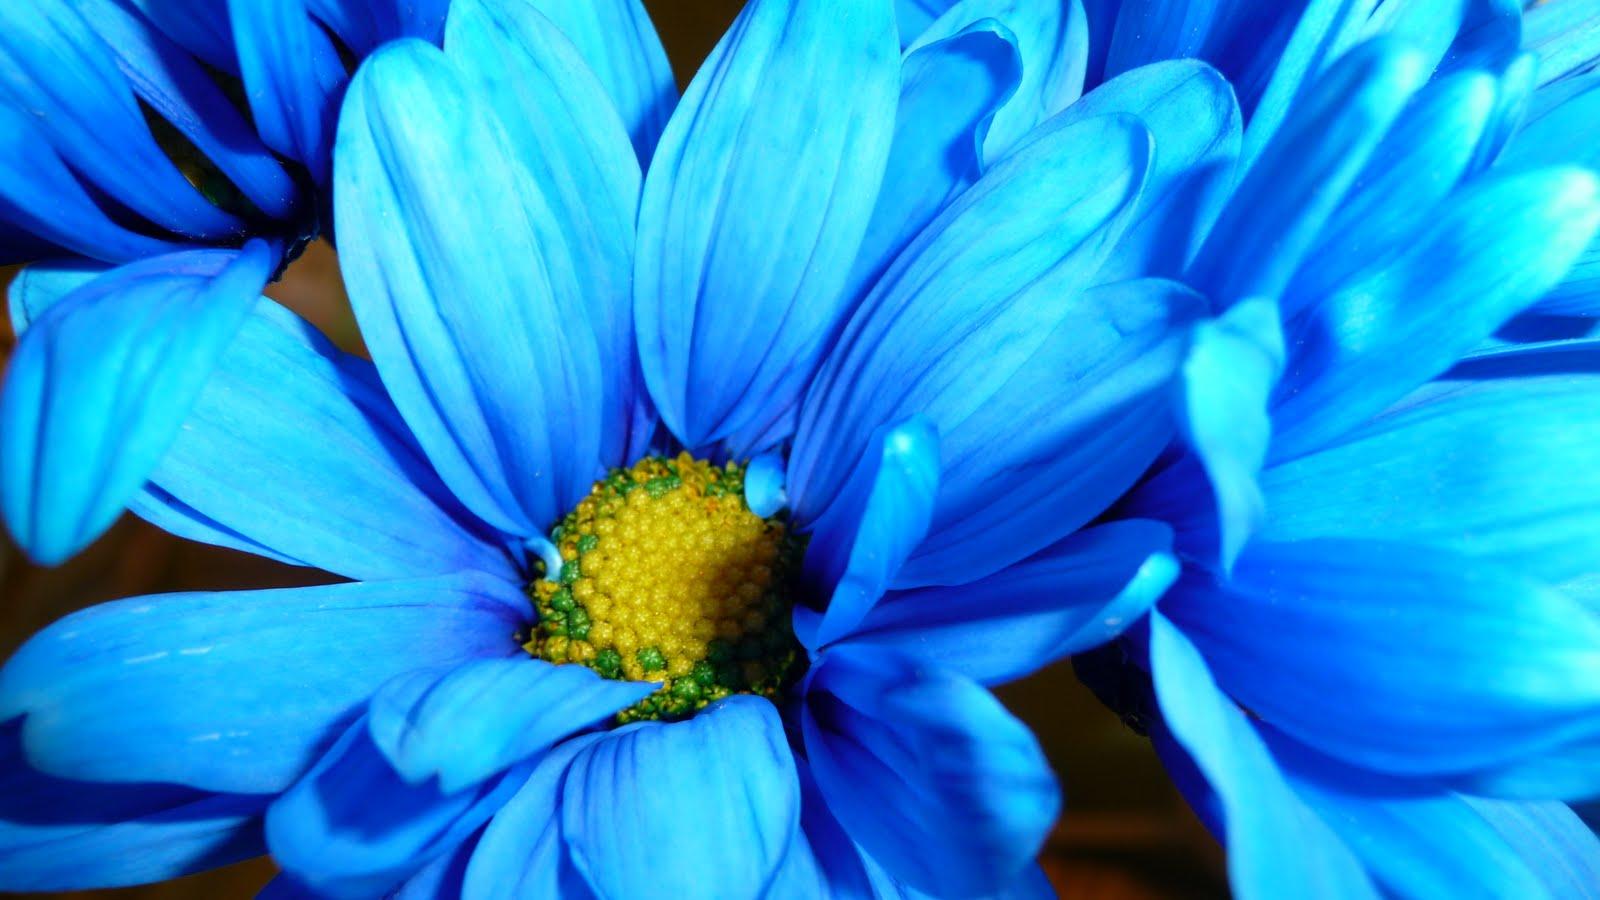 Цветы бирюзового цвета фото названия